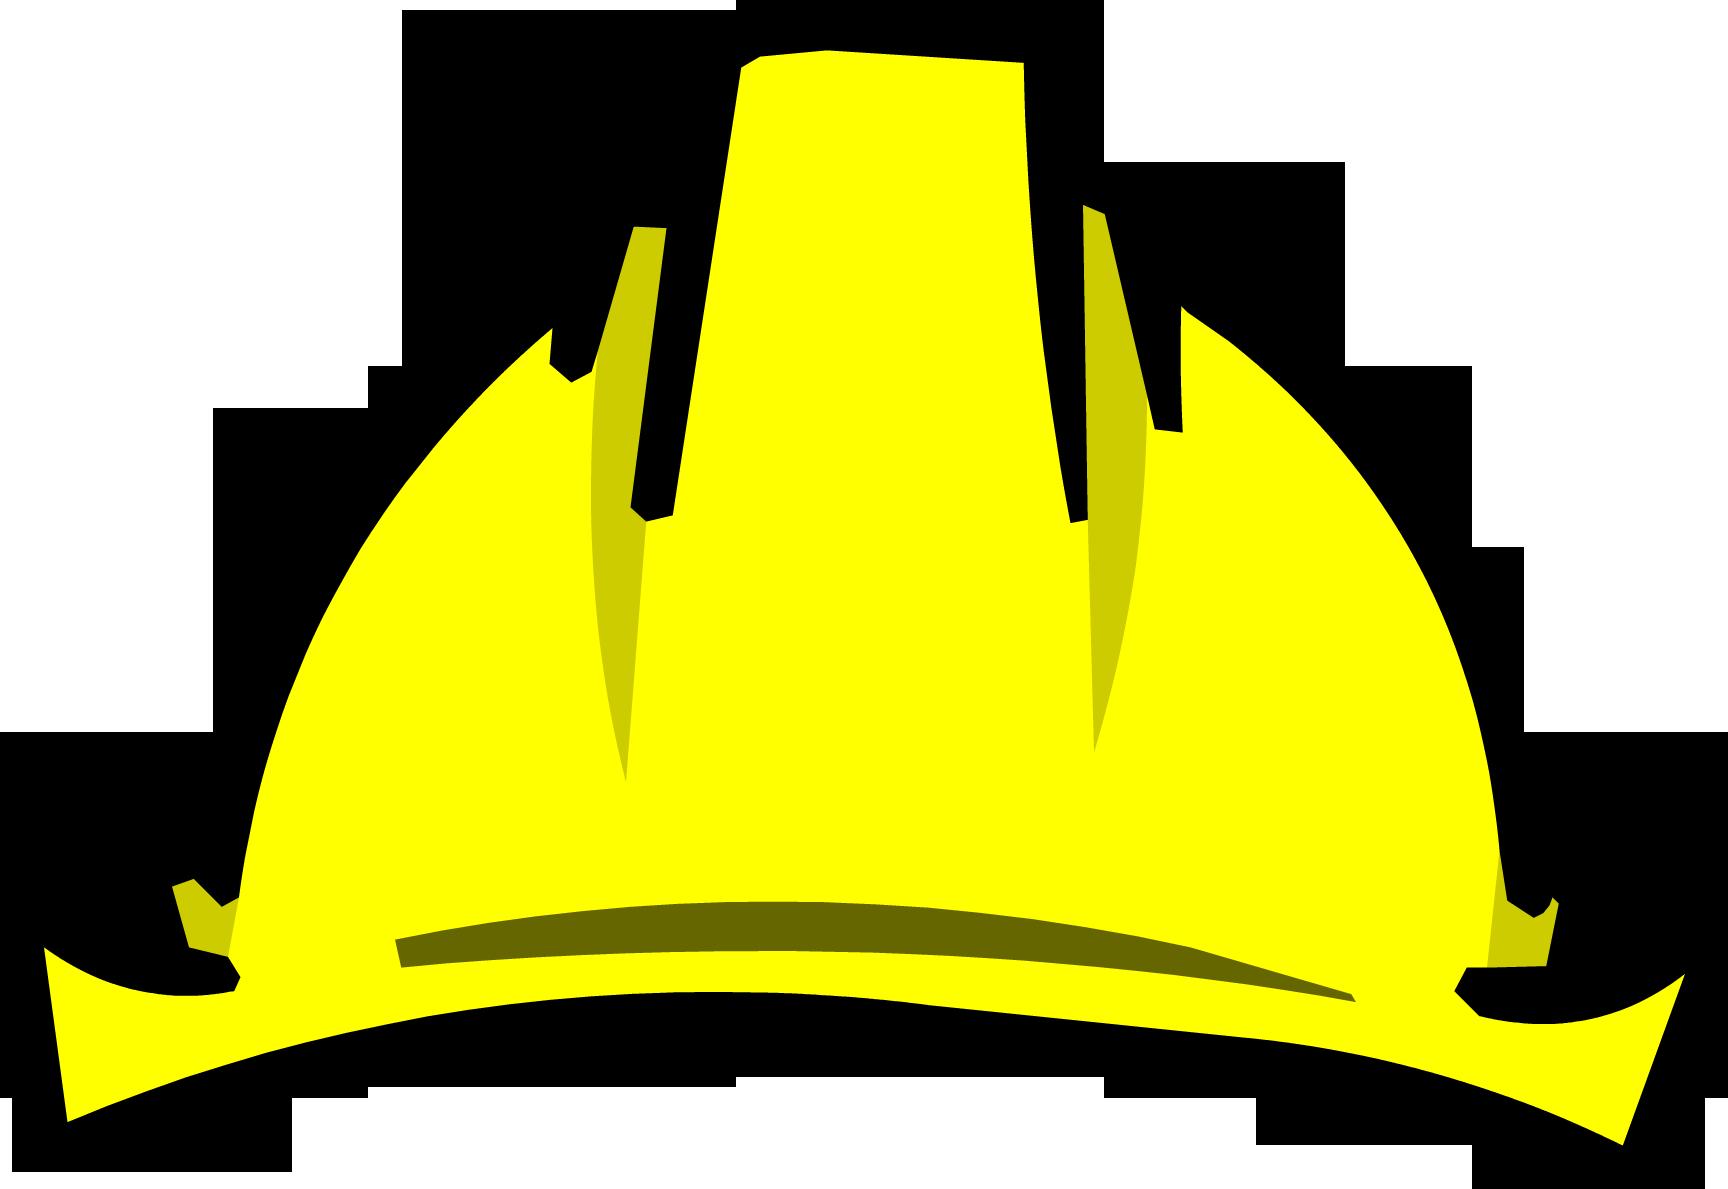 Hard Hat Club Penguin Wiki Fandom Powered By Wikia